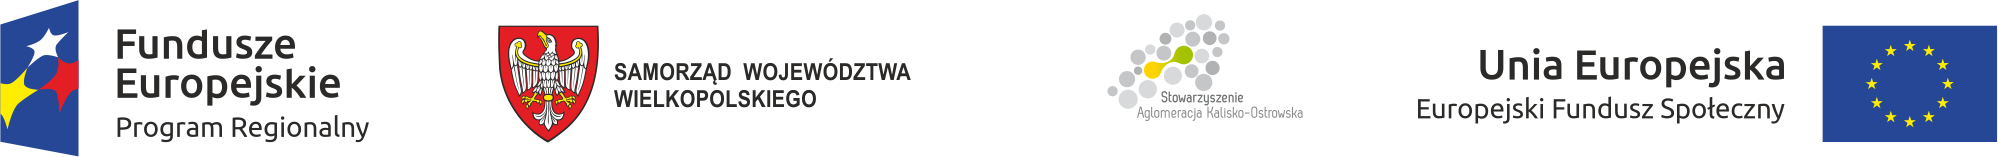 logotypy FEPR-SWW-SAKO-UE_EFS_EFS_kolor_04-2017